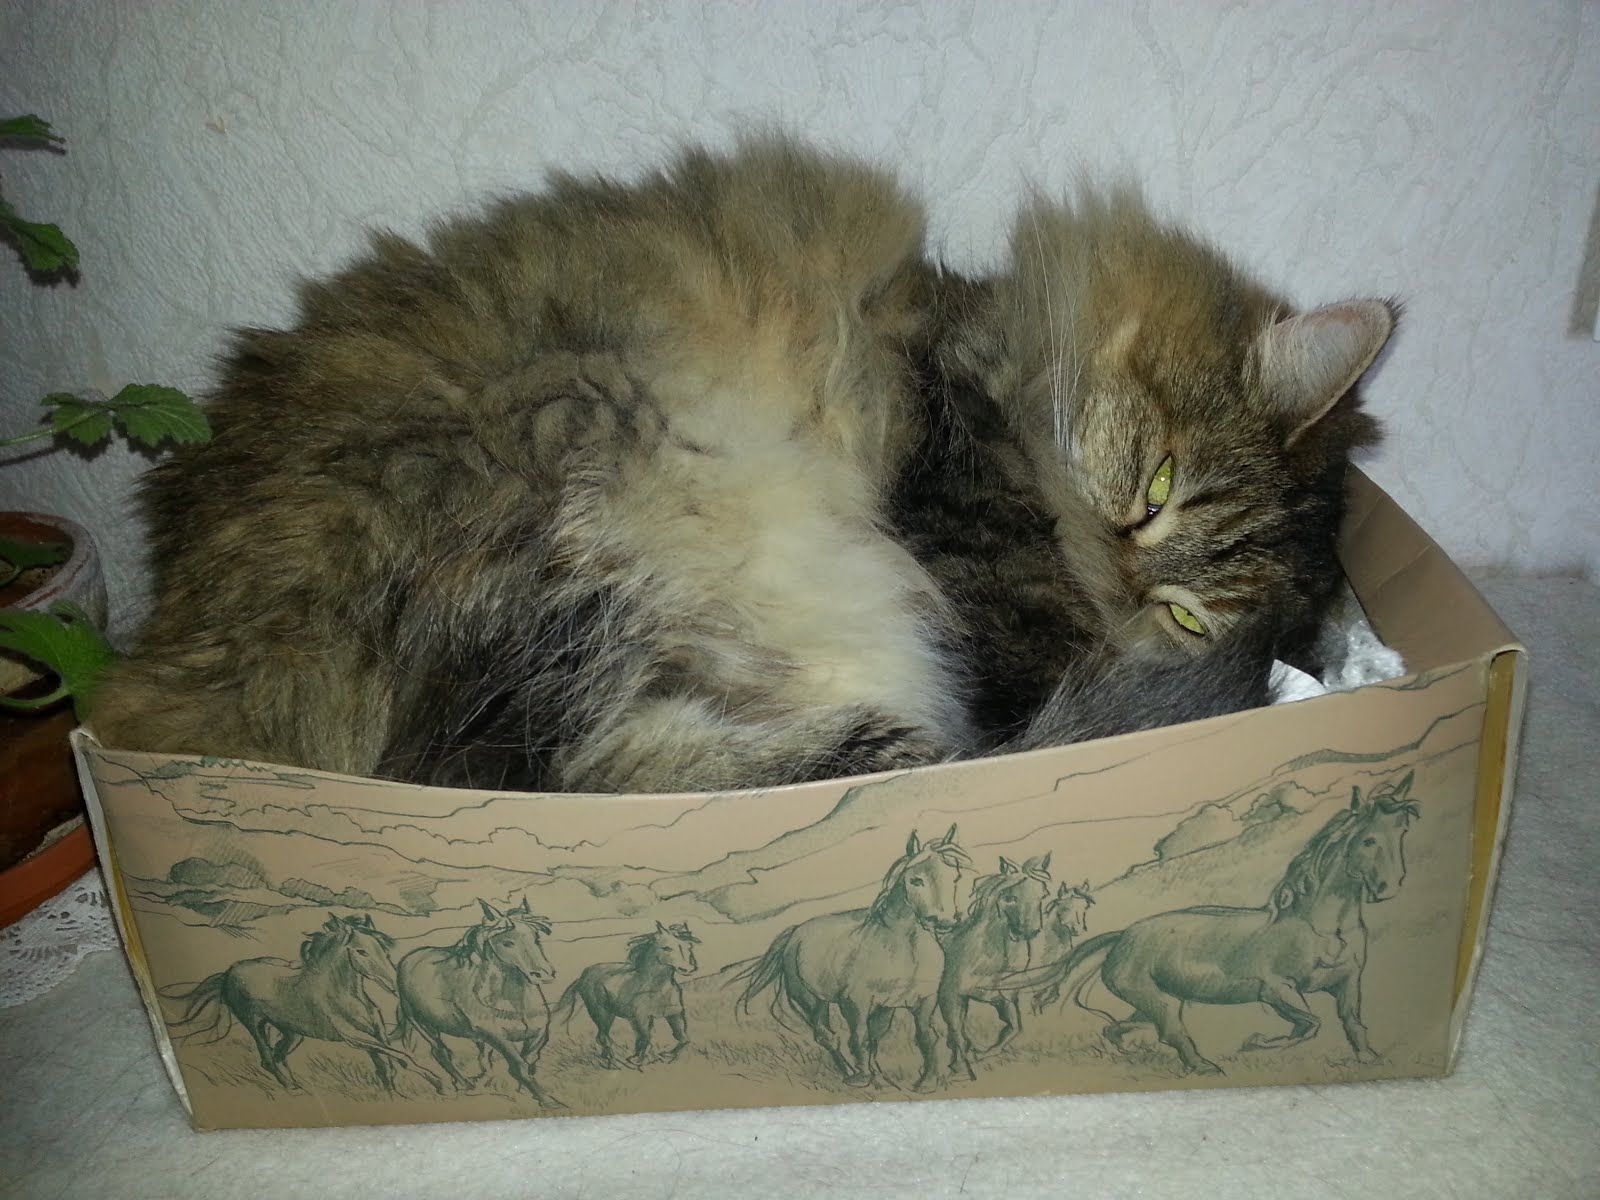 Min älskade katt Agnes